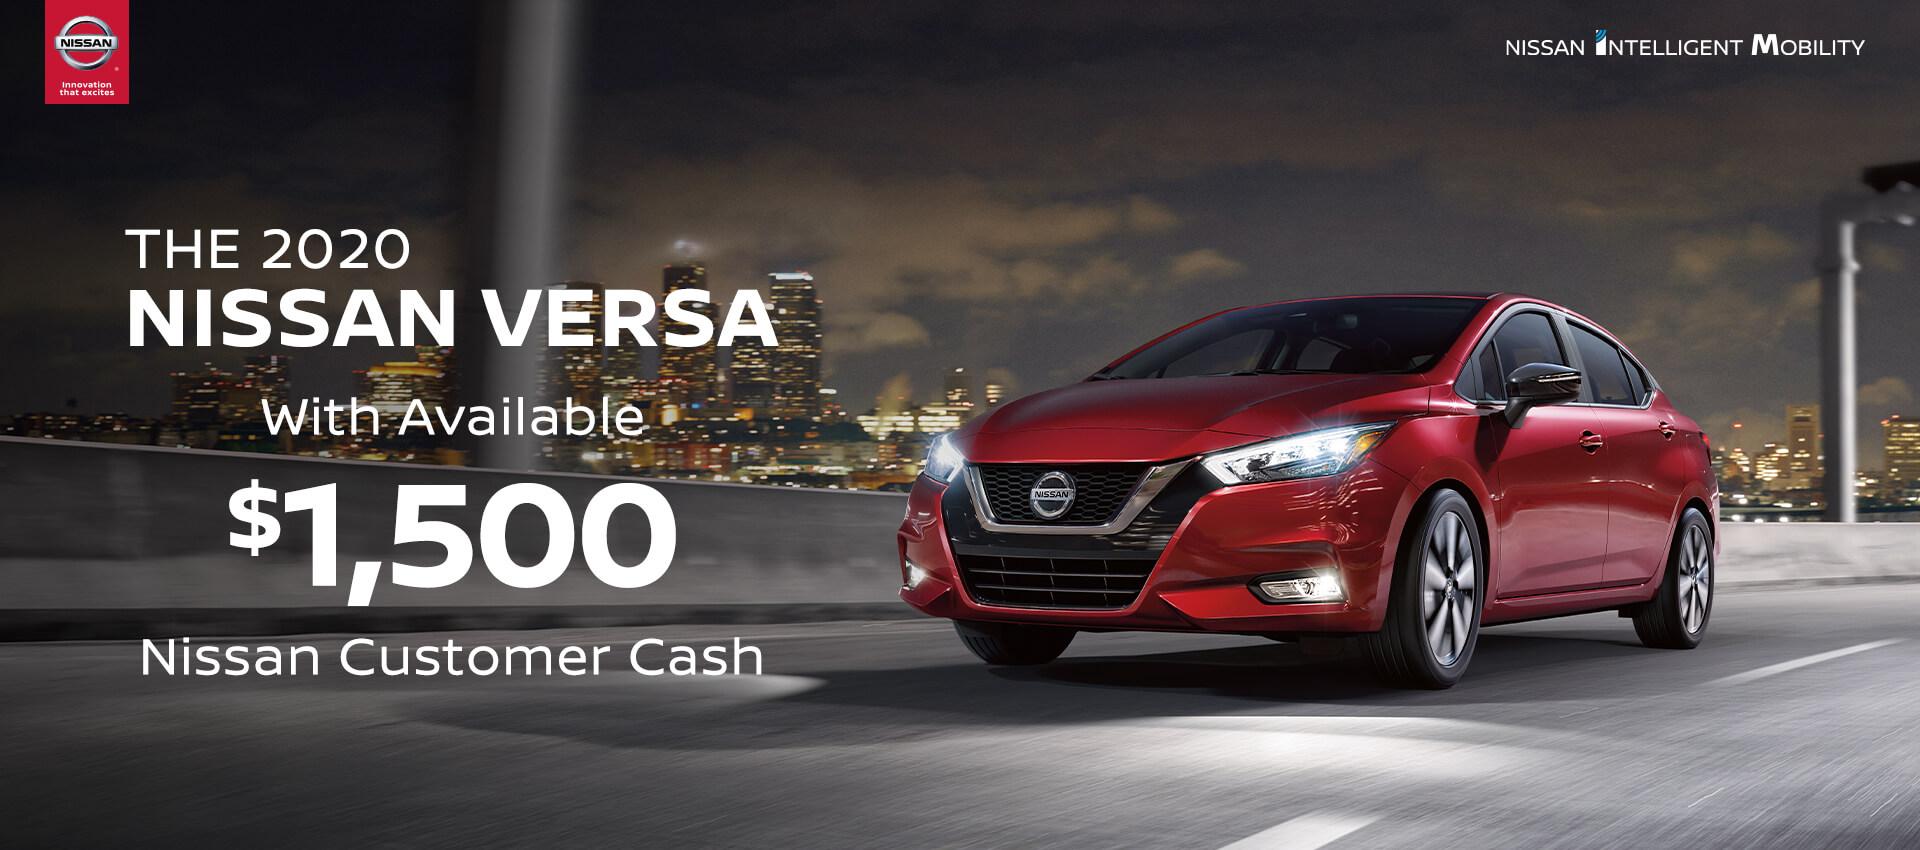 2020 Versa $1,500 Customer Cash